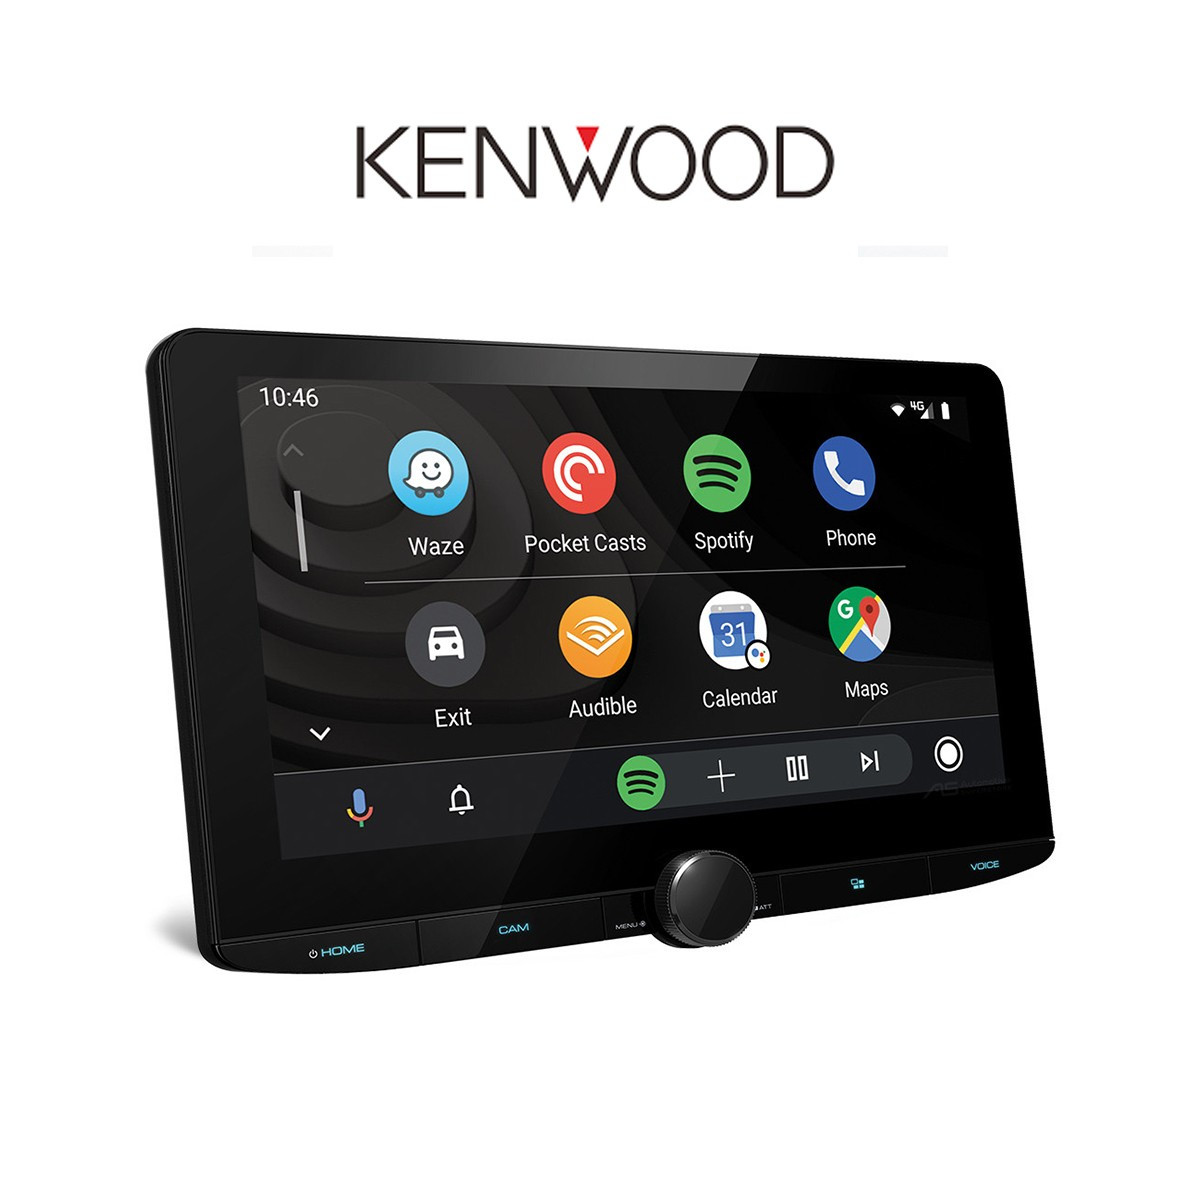 Kenwood DMX 9720XDS - Headunit 2 Din 10.1 Inchi HD Display & Hi Res